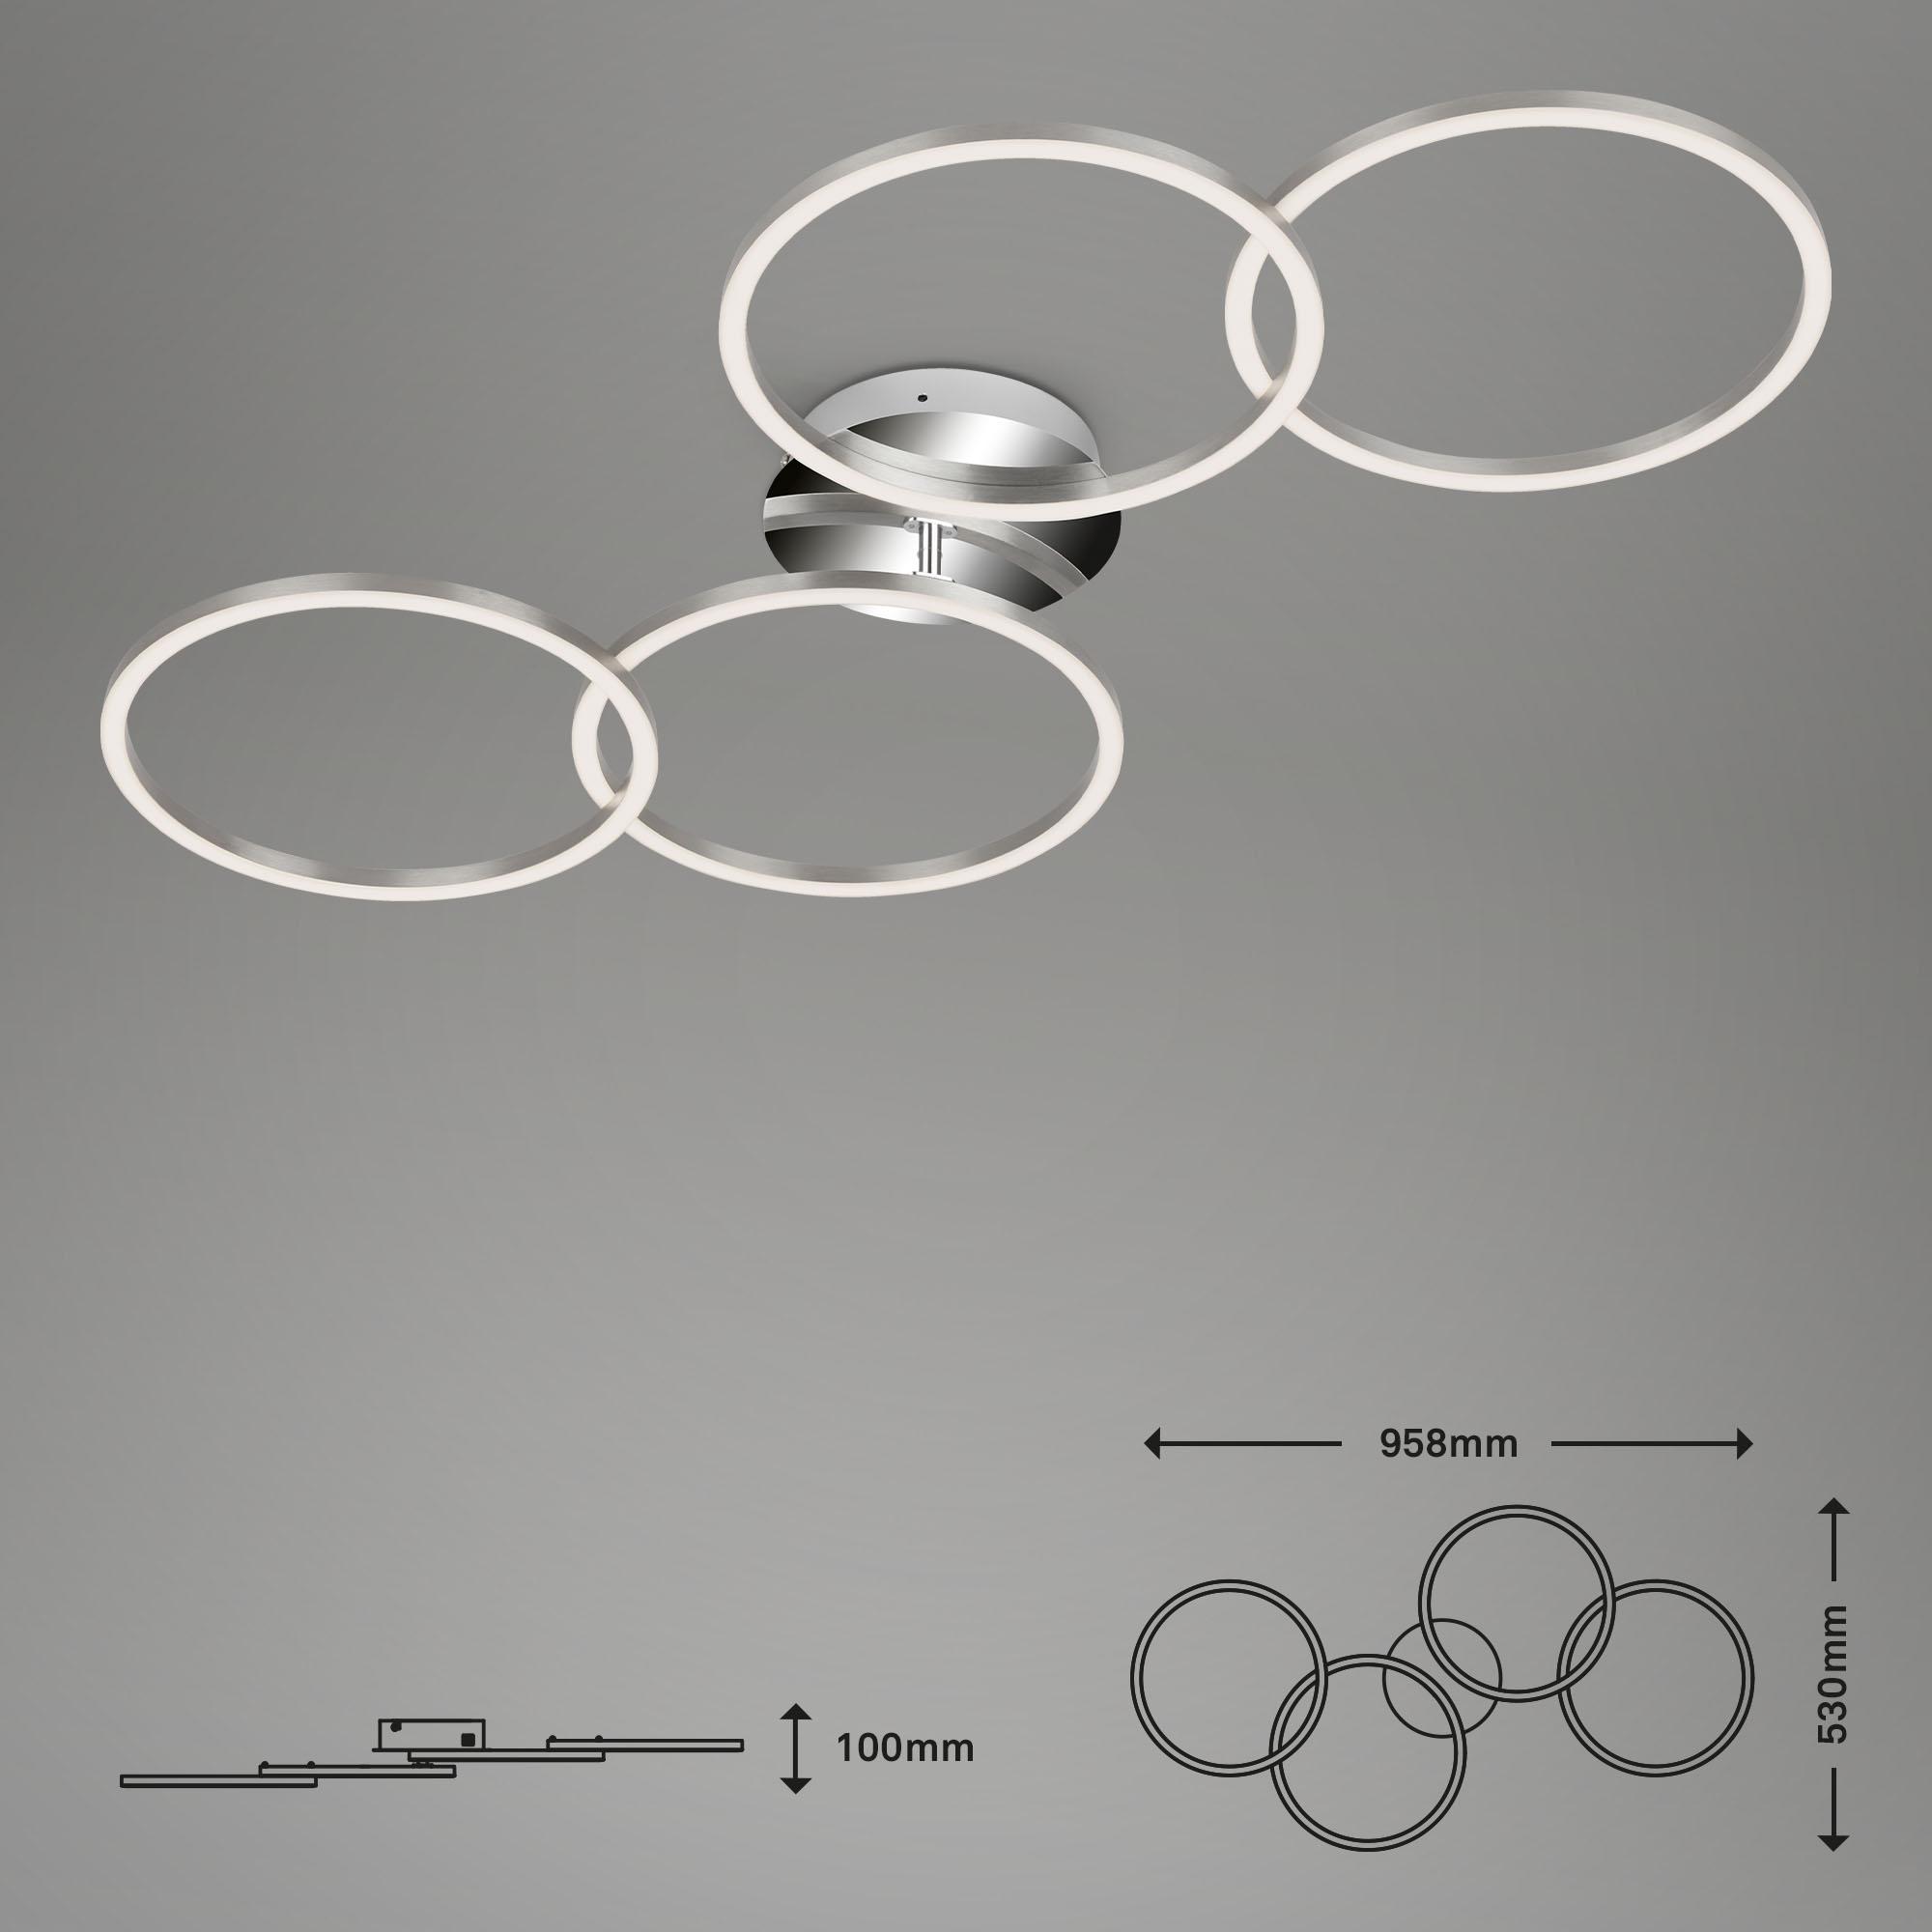 Frame CCT LED Deckenleuchte alufarbig-chrom Maßzeichnung